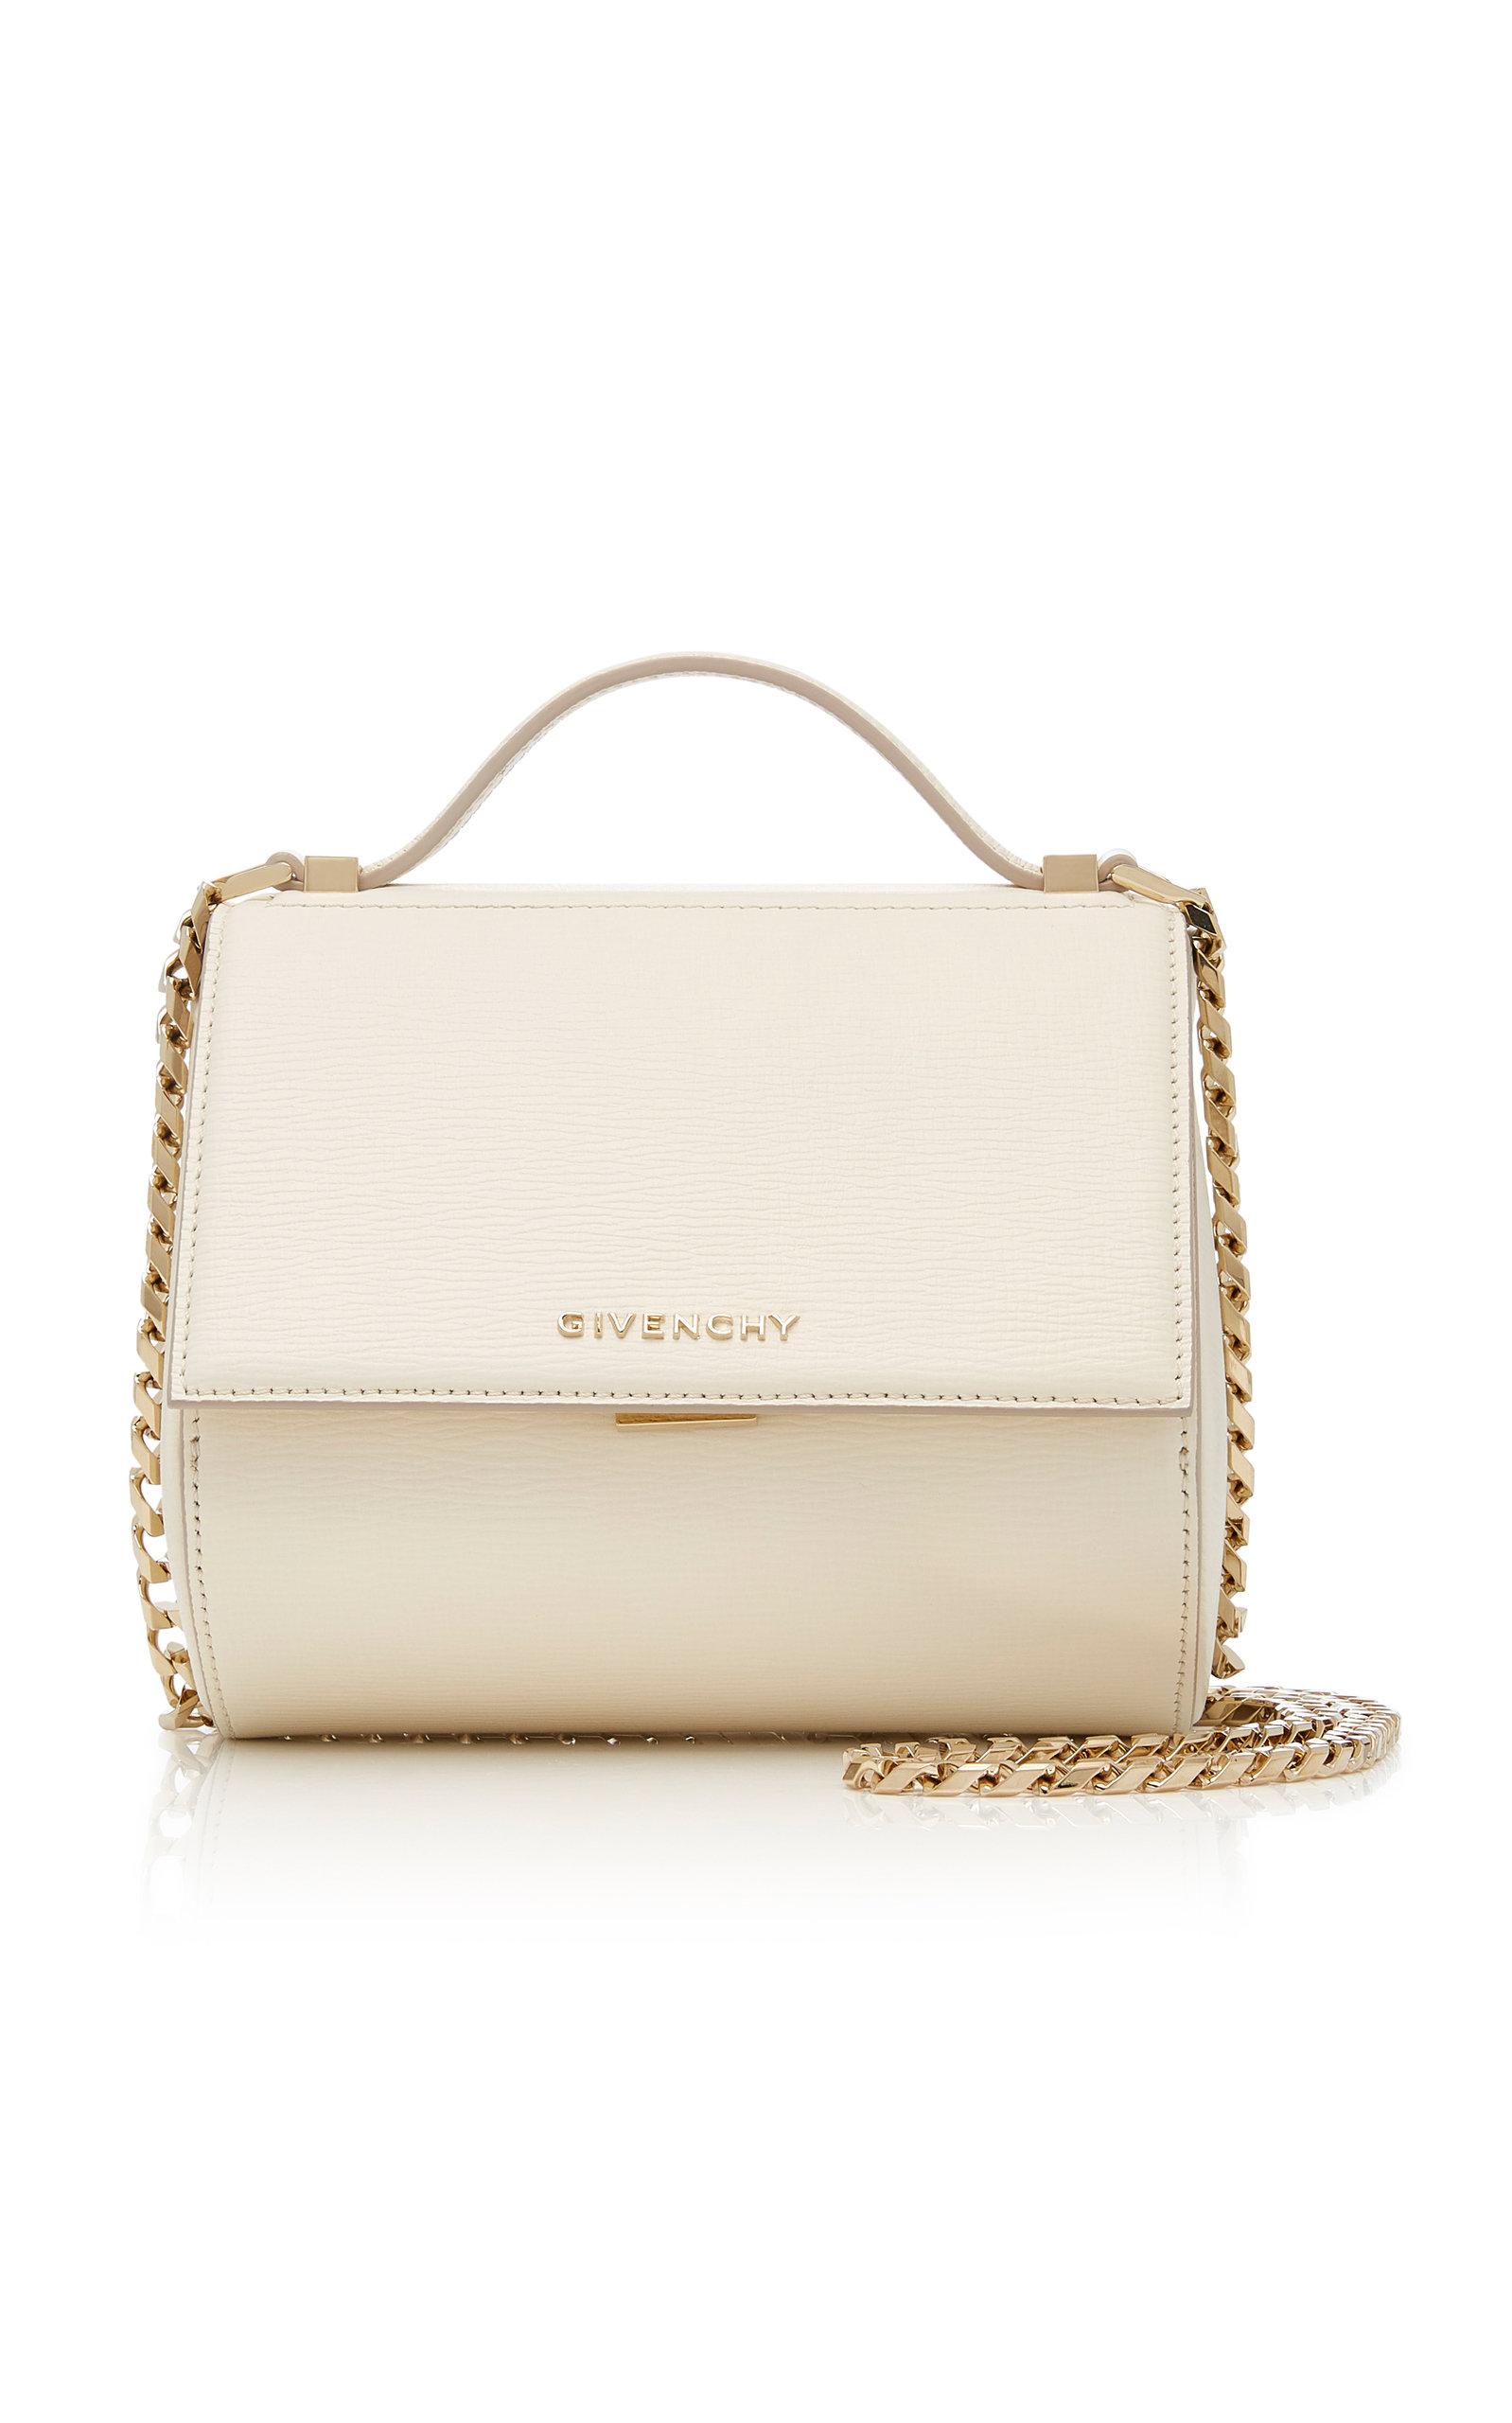 dcc49d2e53a Mini Pandora Box Leather Shoulder Bag by Givenchy   Moda Operandi